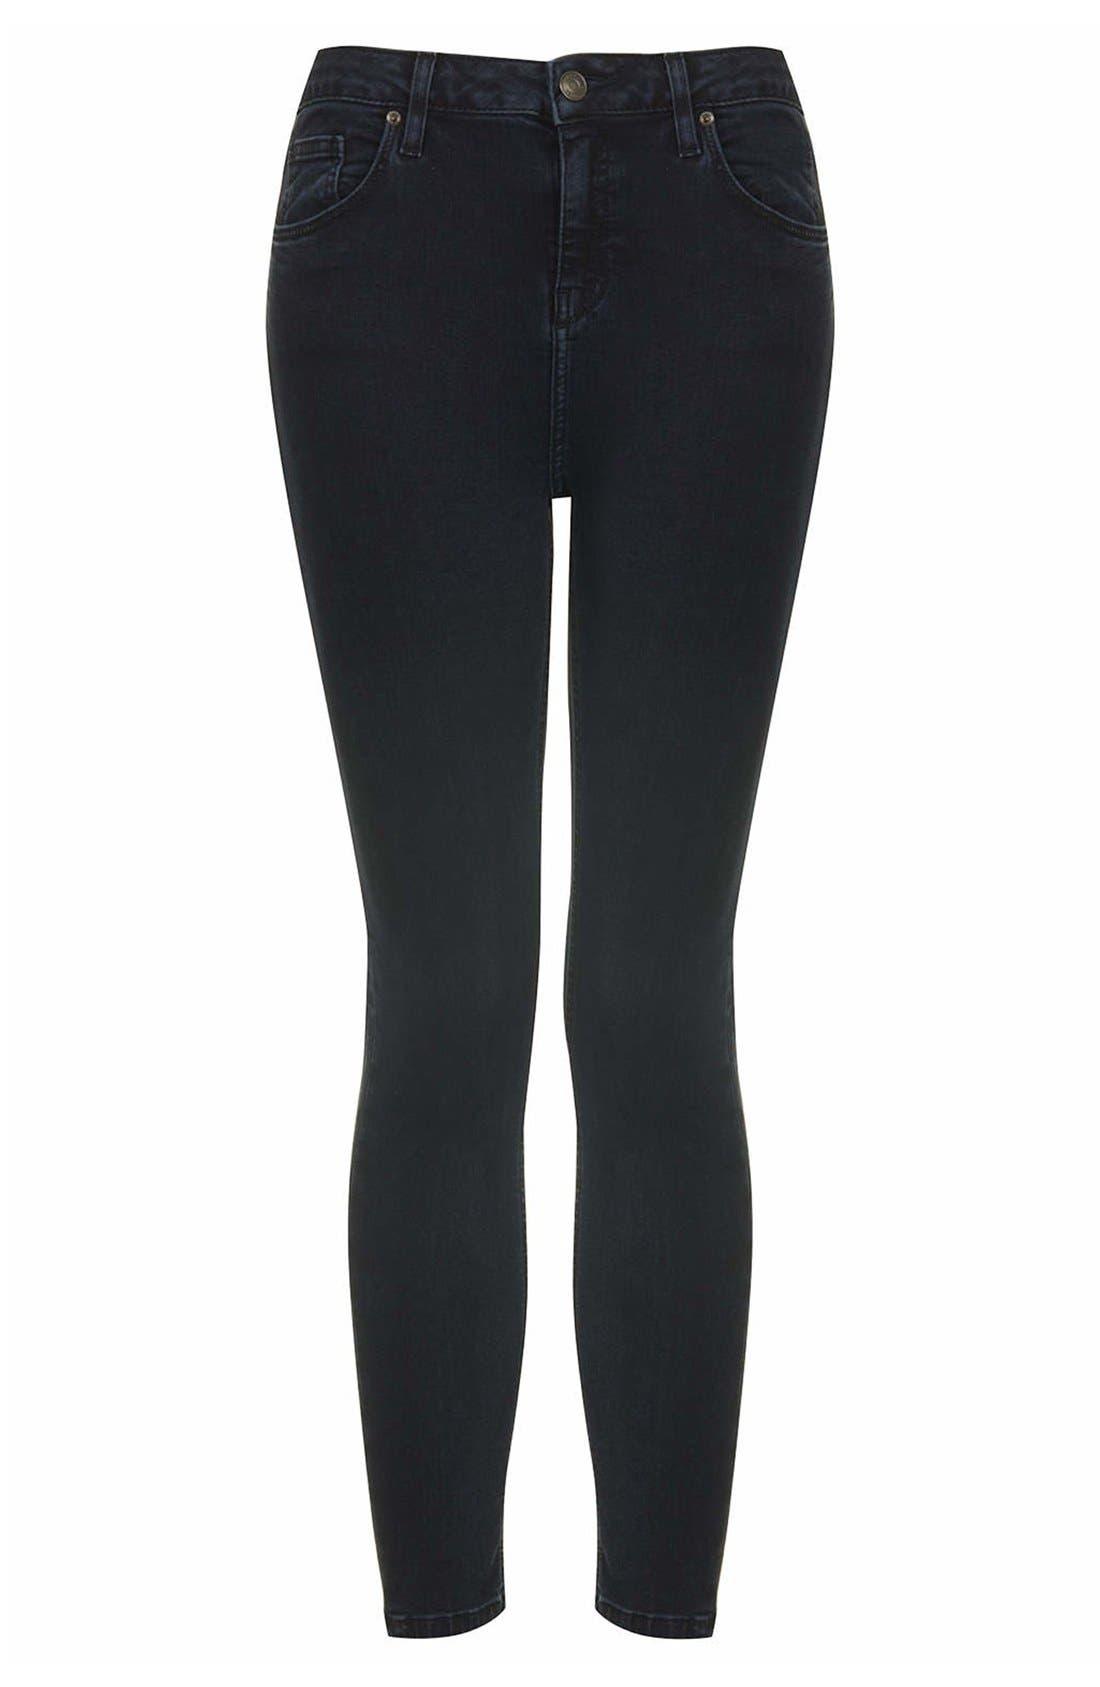 Alternate Image 3  - Topshop Moto 'Jamie' High Rise Ankle Skinny Jeans (Blue Black) (Regular, Short & Long)